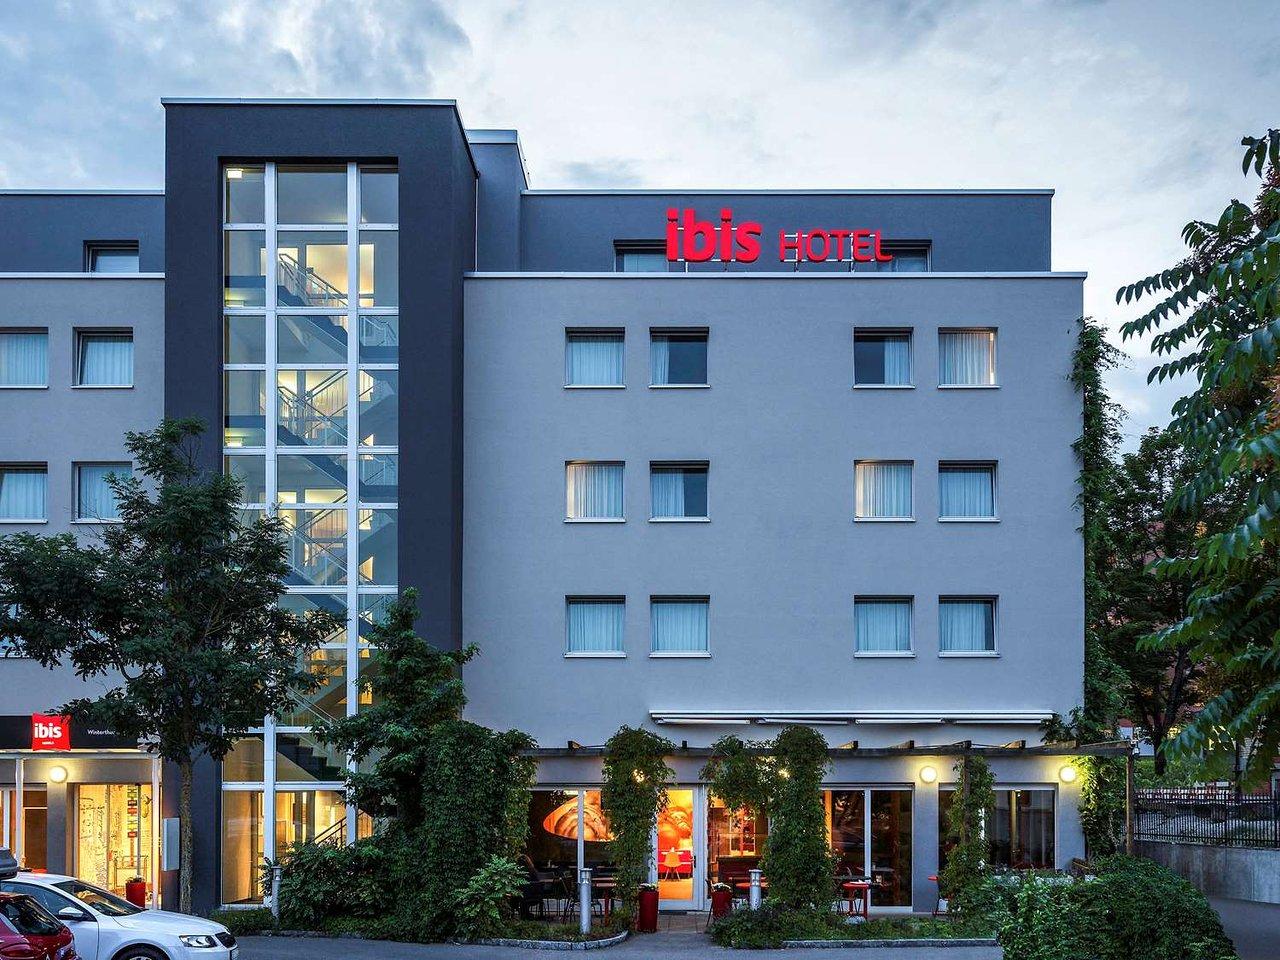 ibis winterthur city 92 1 0 4 updated 2019 prices hotel rh tripadvisor com